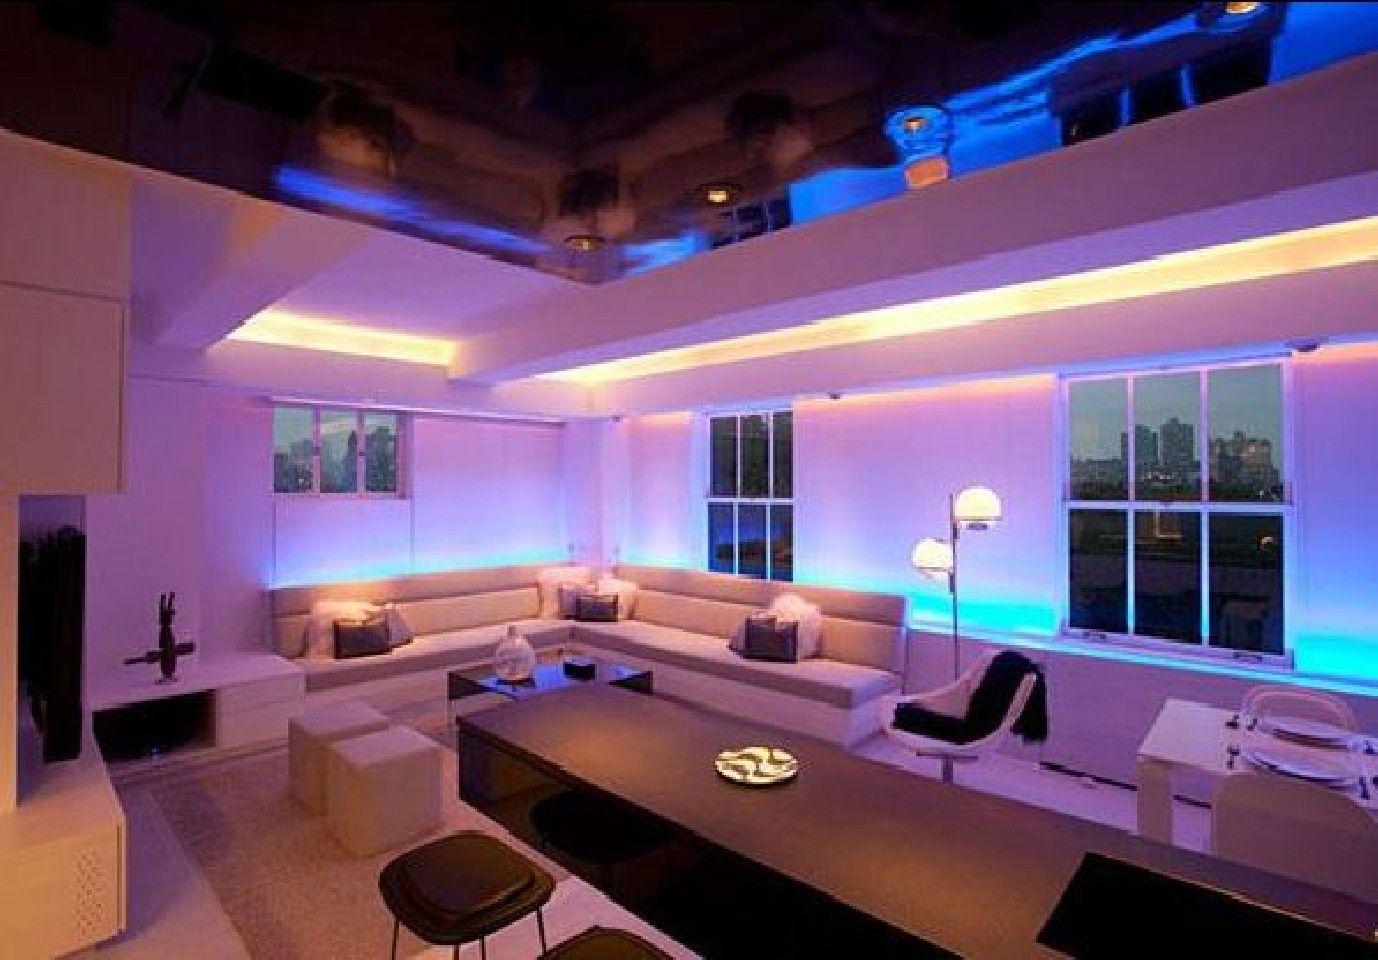 Rgb Led Strip Lights Range Of Applications Lighting Design